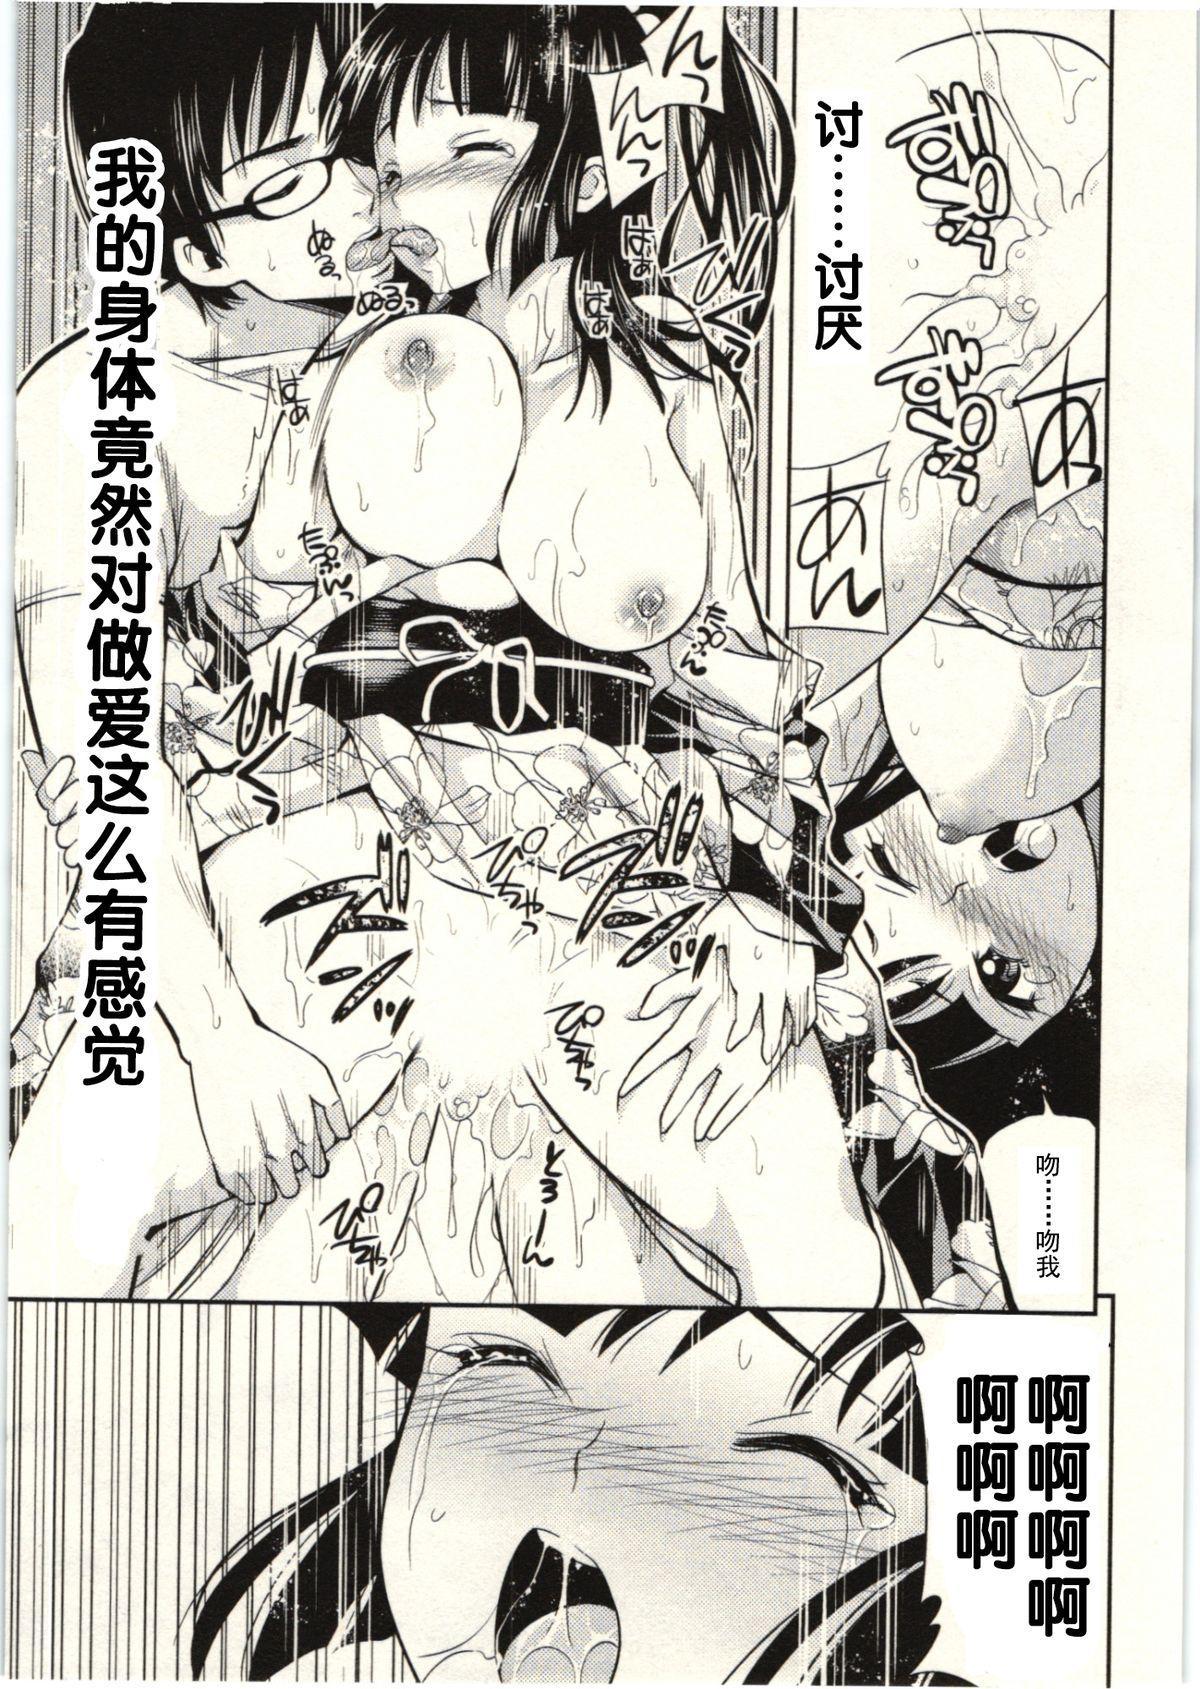 Tadashii Majutsu no Asobikata - The right way of playing of magic. 119